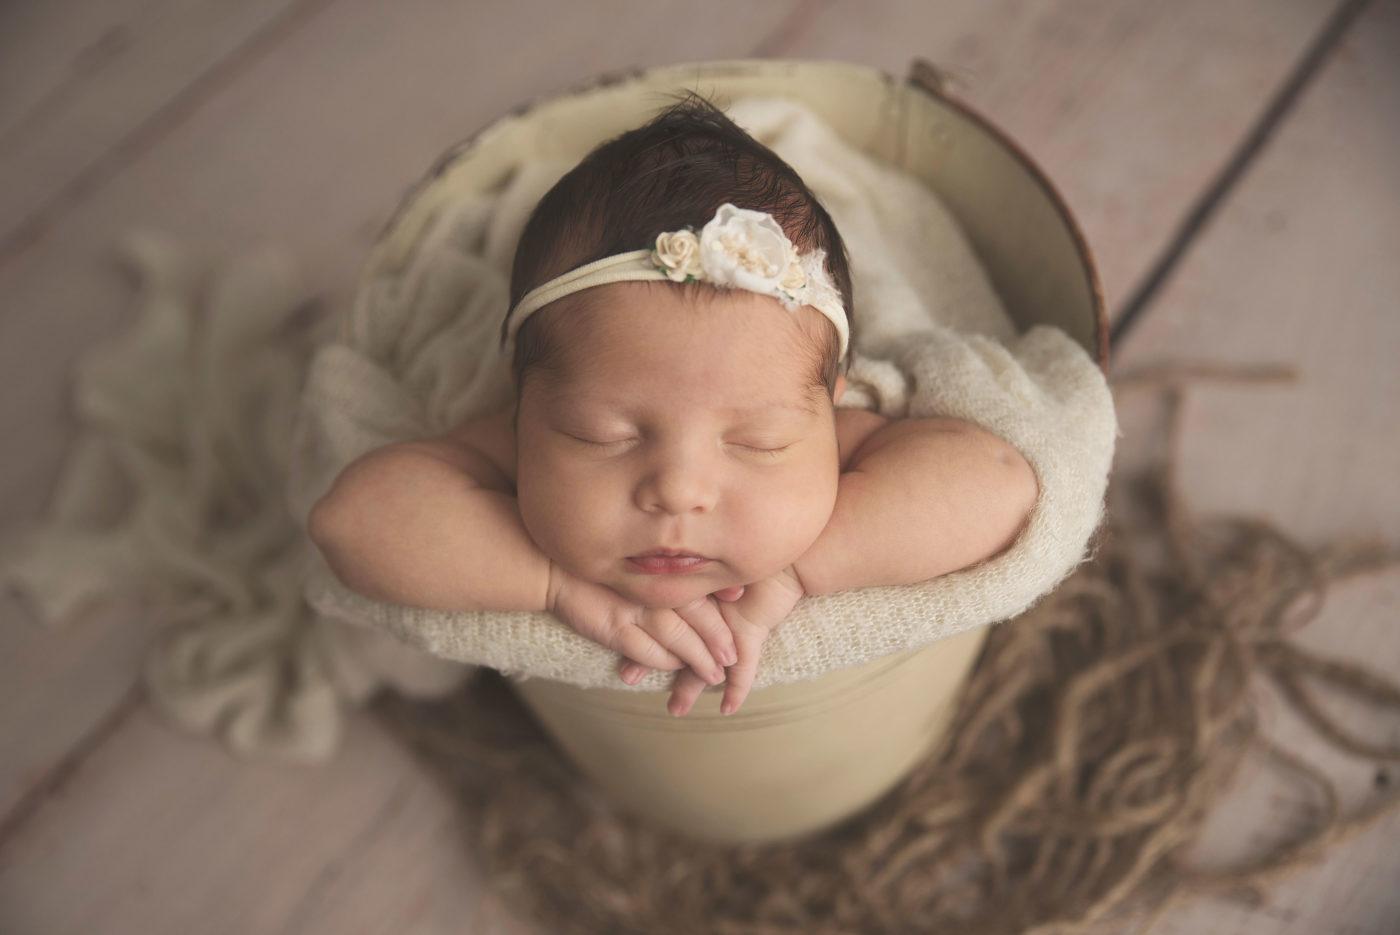 newborn-photography-sydney-baby-photo-shoot